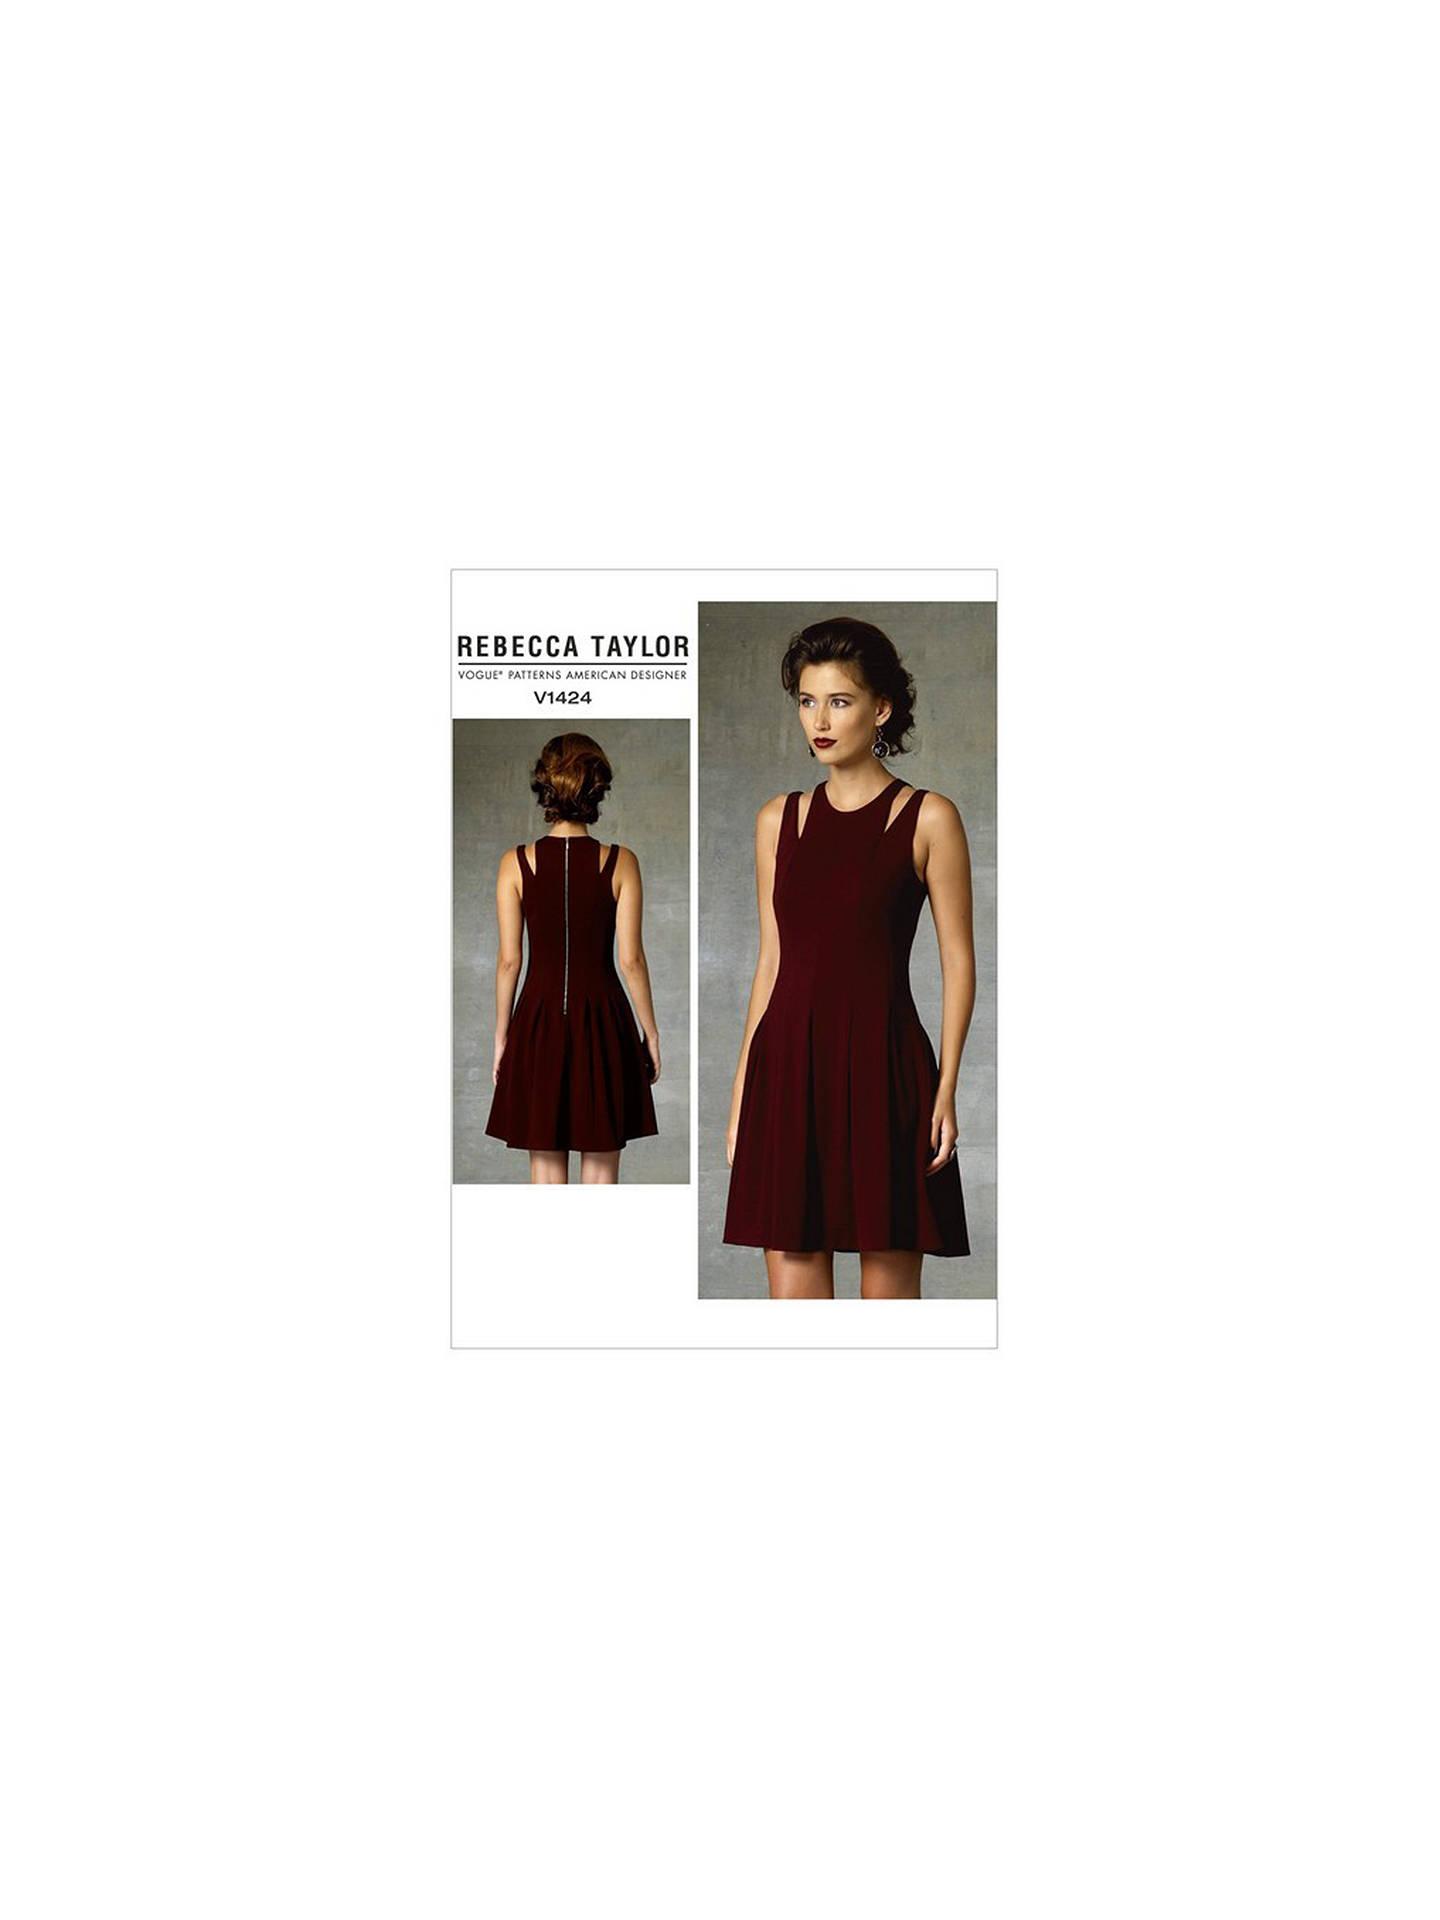 Vogue Women S Rebecca Taylor Dress Sewing Pattern 1424 At